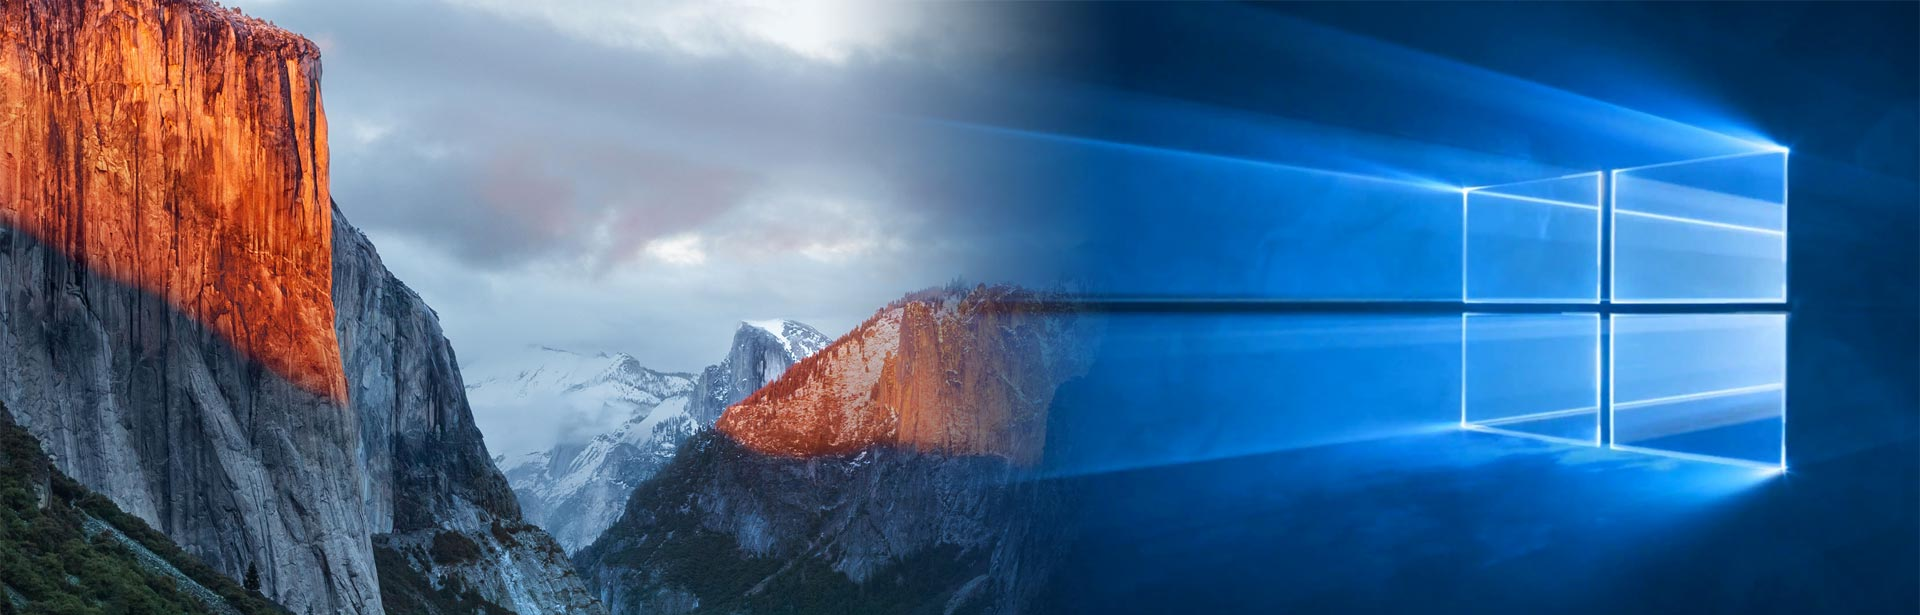 Mac OS X - Windows